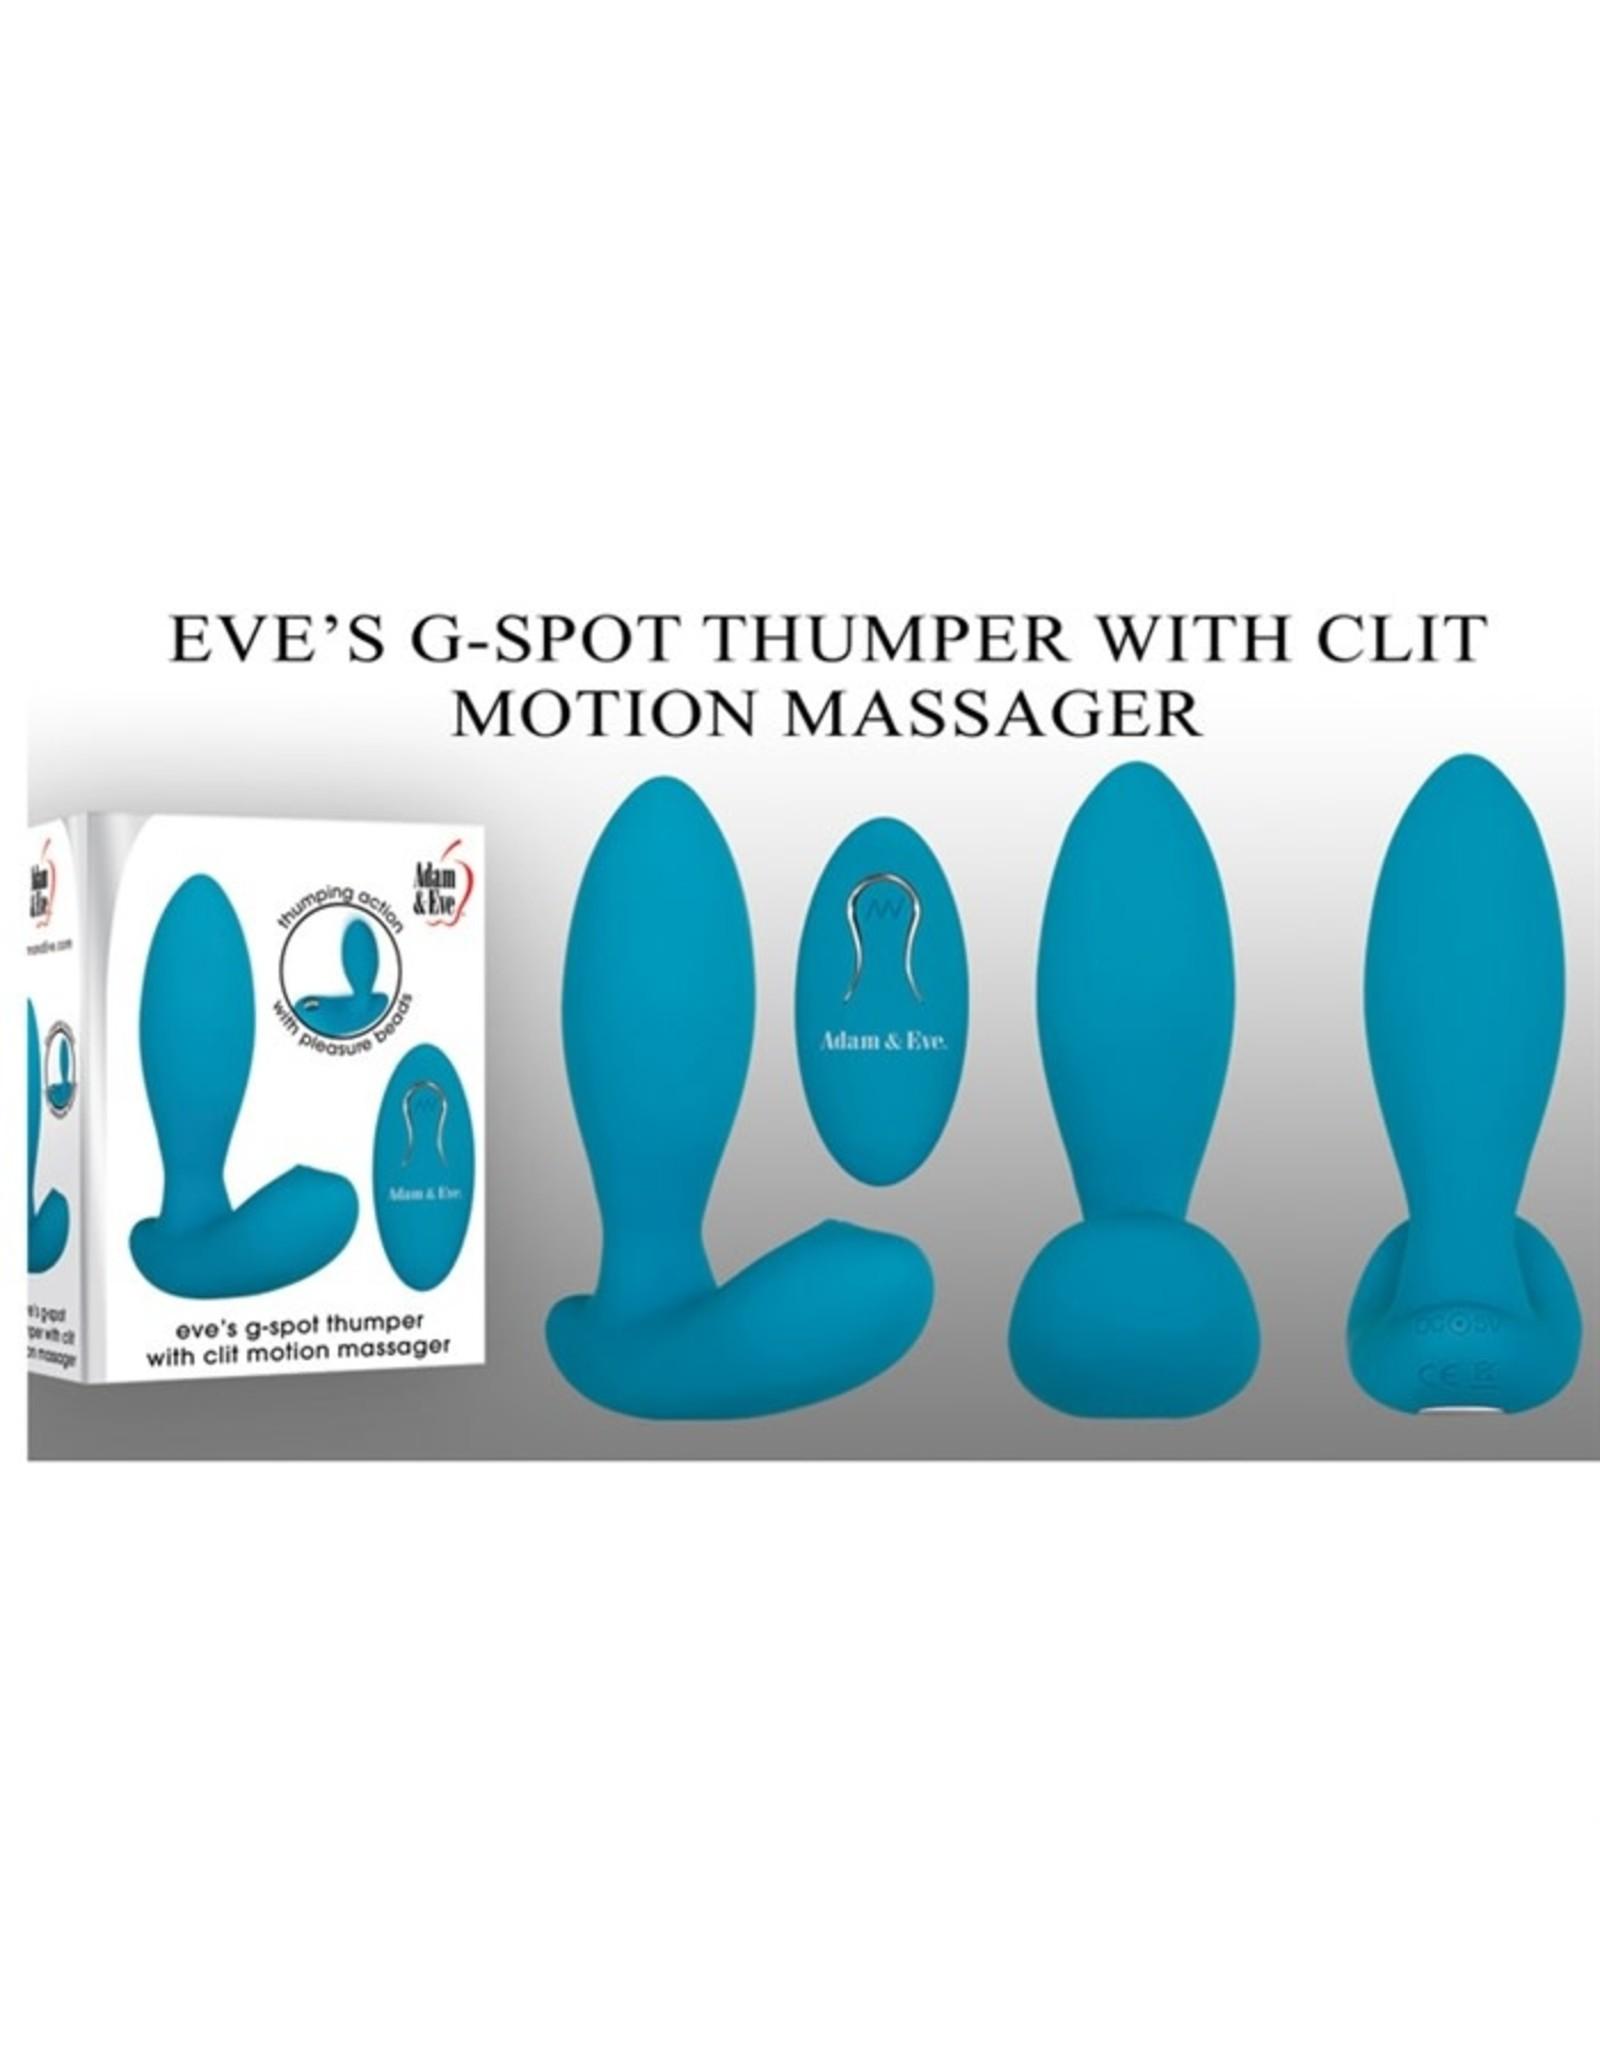 Adam & Eve Eve's G-Spot Thumper with Clit Motion Massager